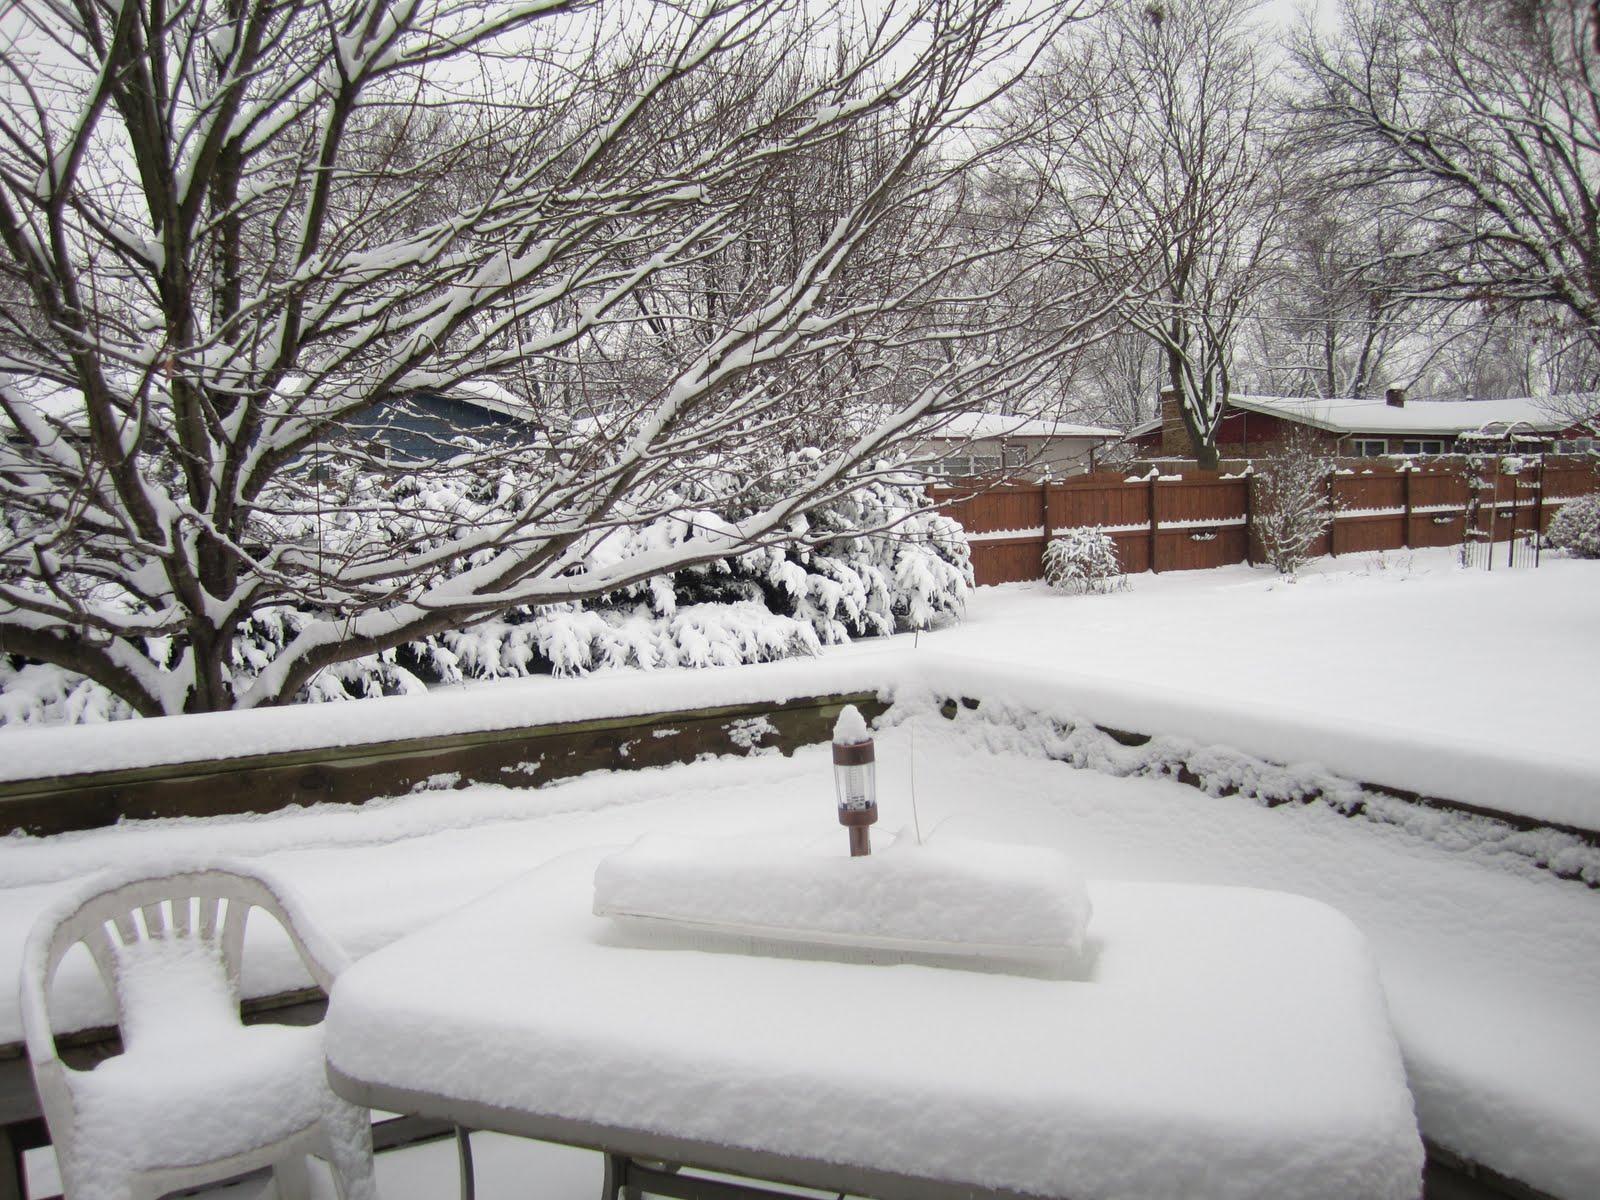 http://1.bp.blogspot.com/_VeGi-XrsuB8/TPqYfGFk_8I/AAAAAAAAE6U/3iDjJNQwNwY/s1600/SnowyDayDec10%2B008.jpg